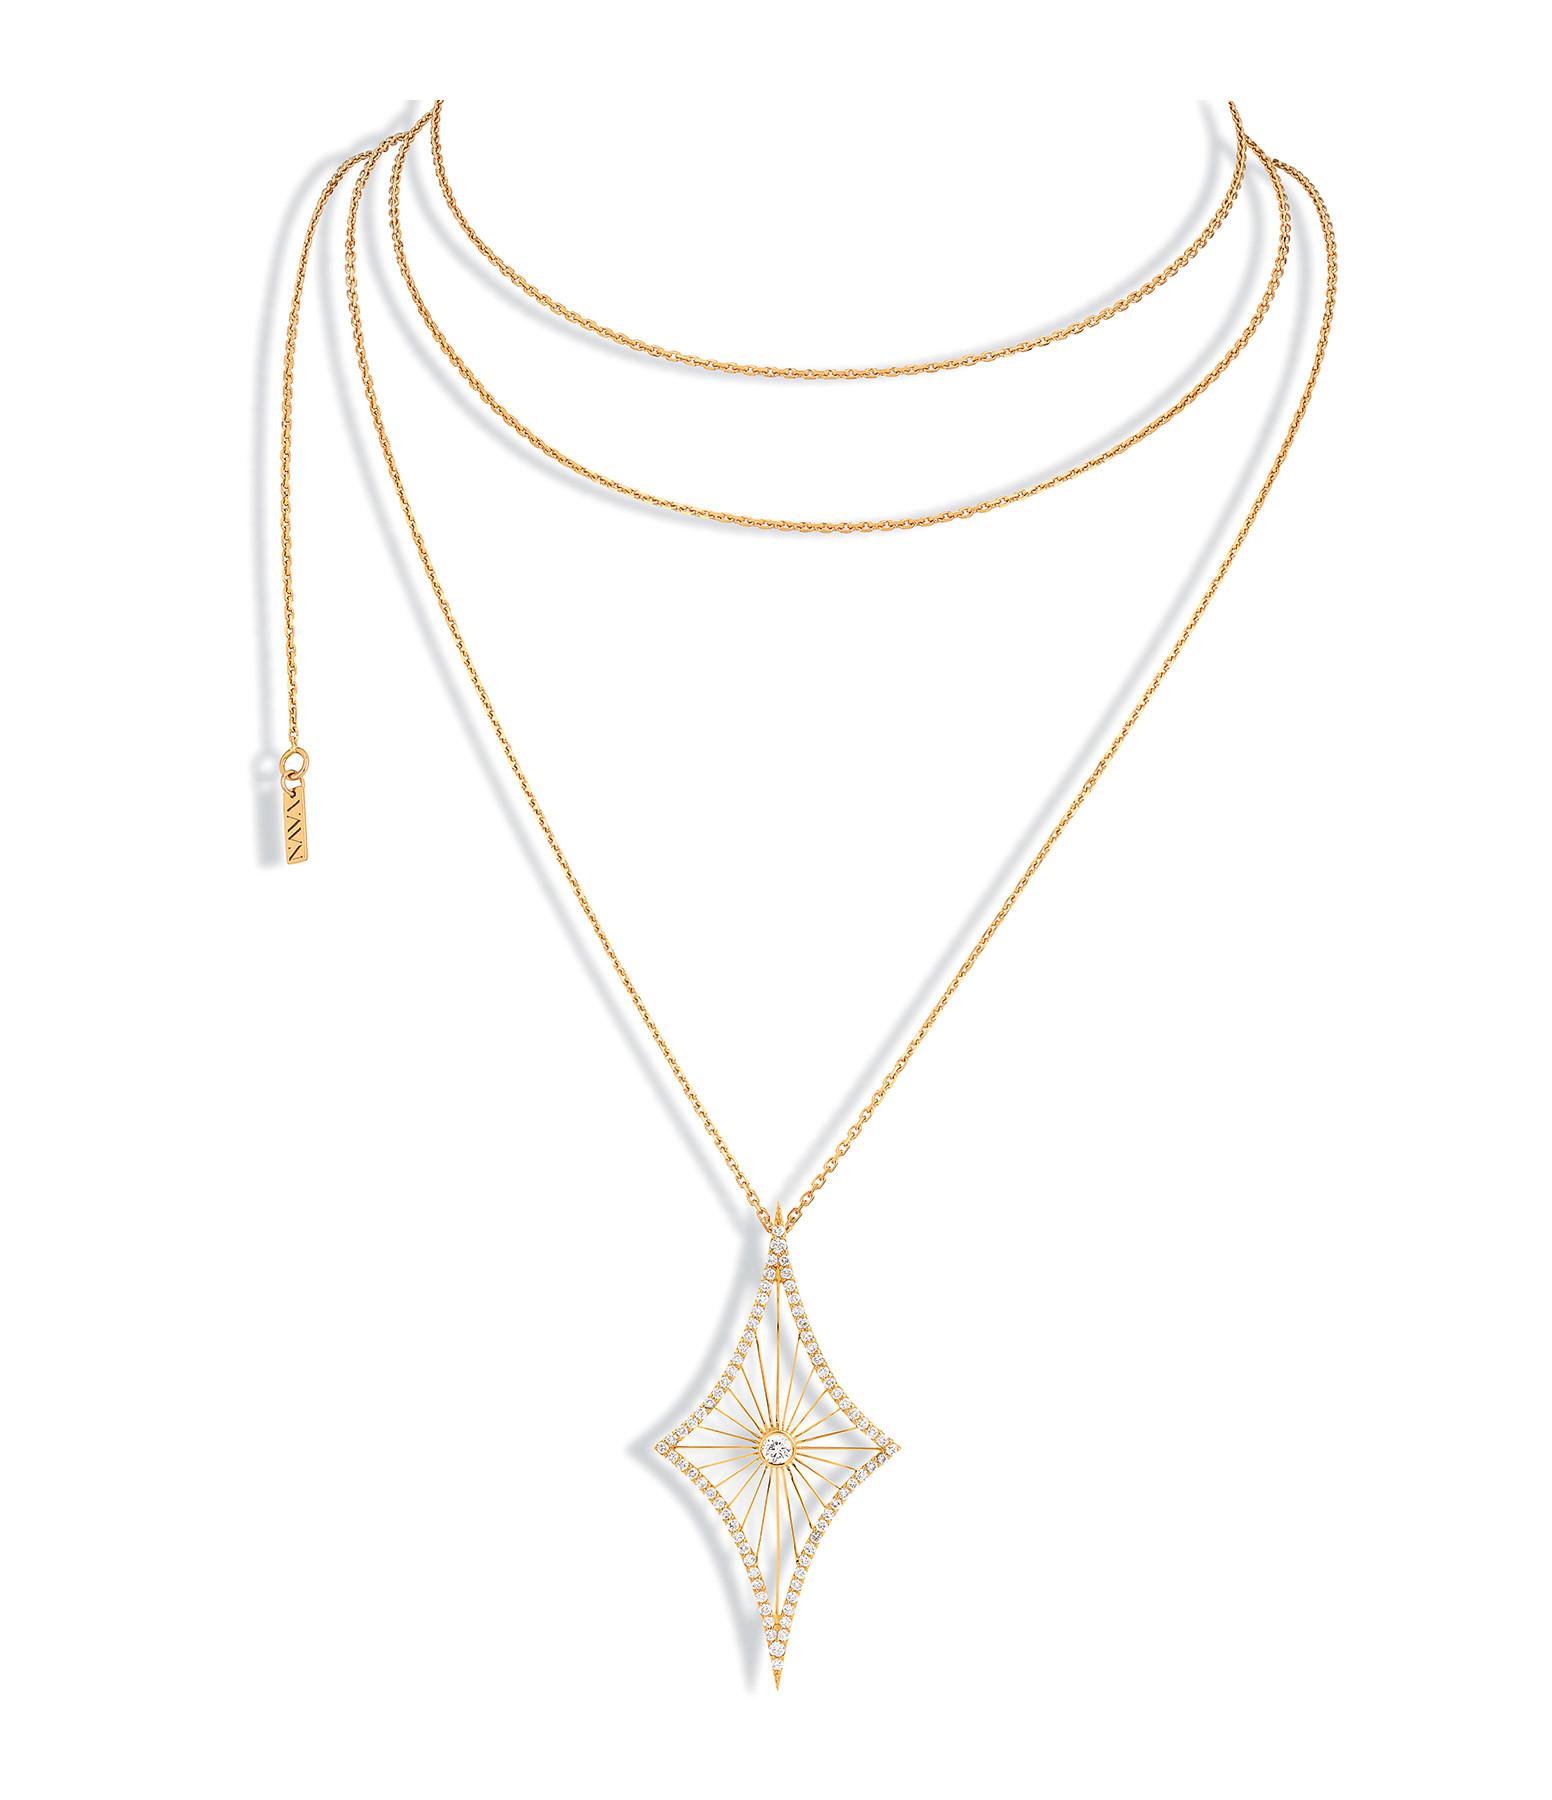 NAVA JOAILLERIE - Sautoir Cheyenne Losange Diamants Or Jaune